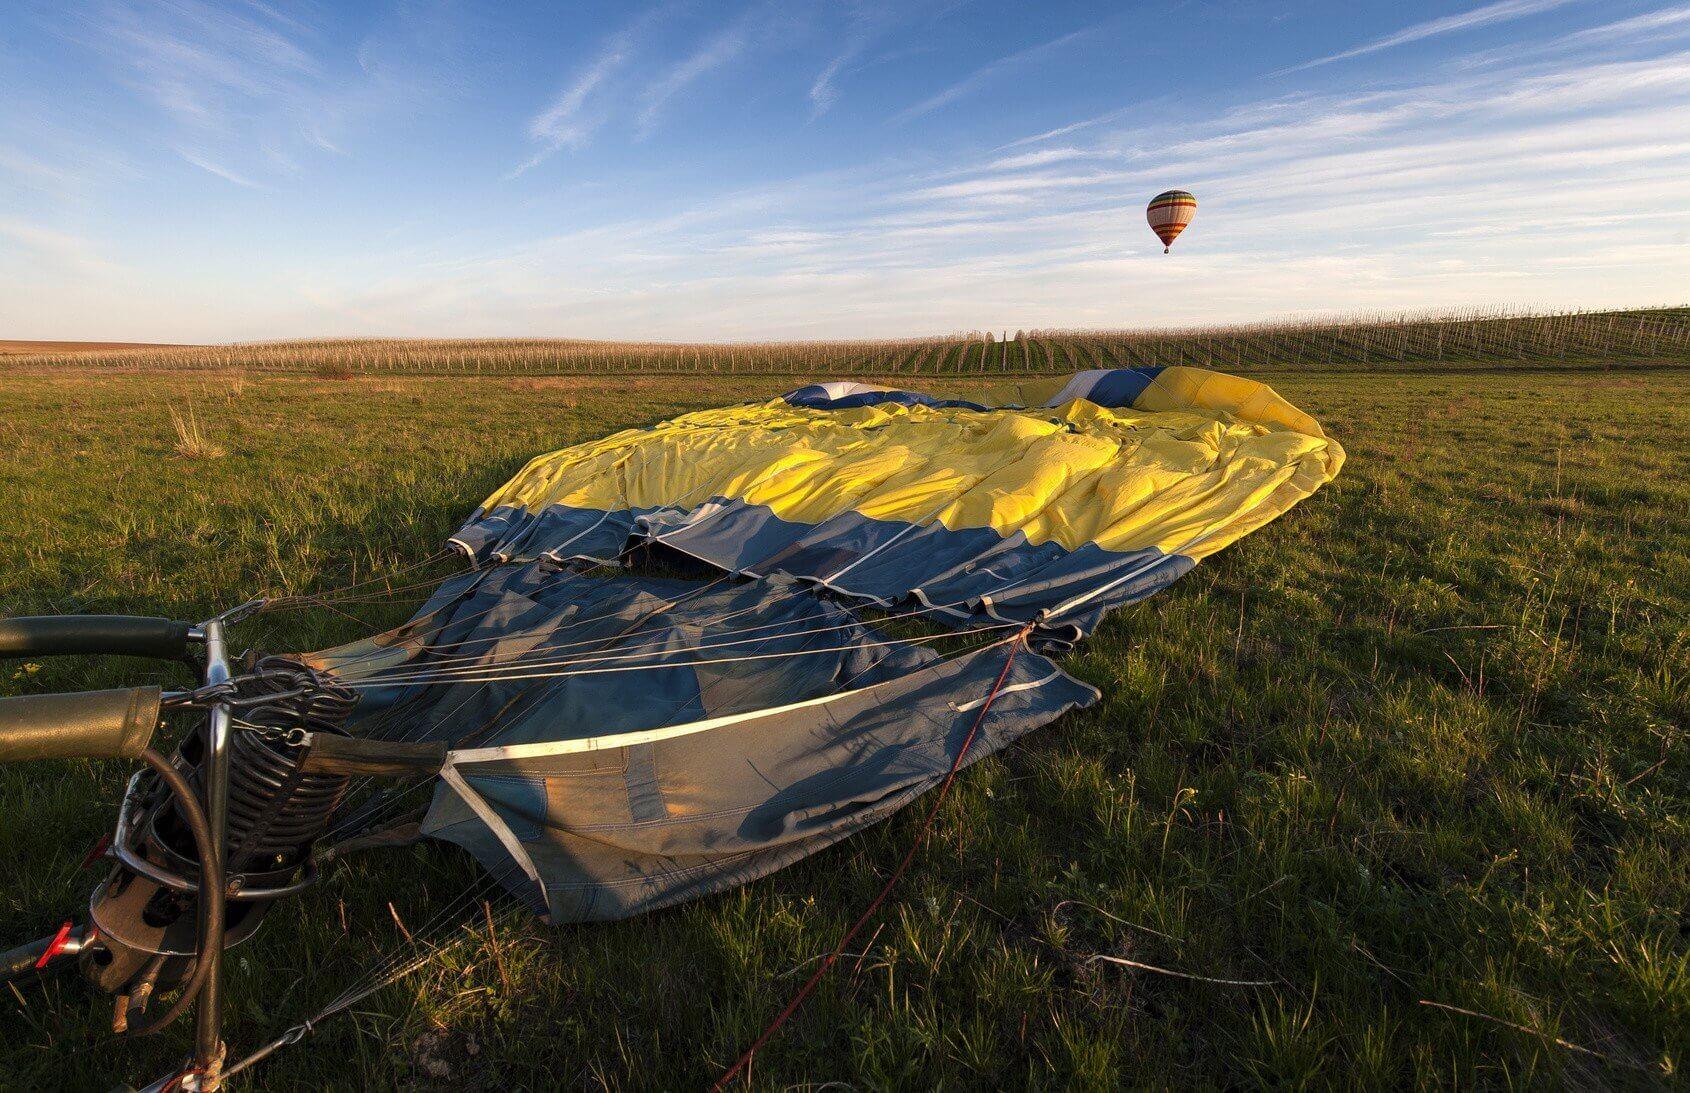 Lot balonem dla 3 osób - Podhale i Tatry